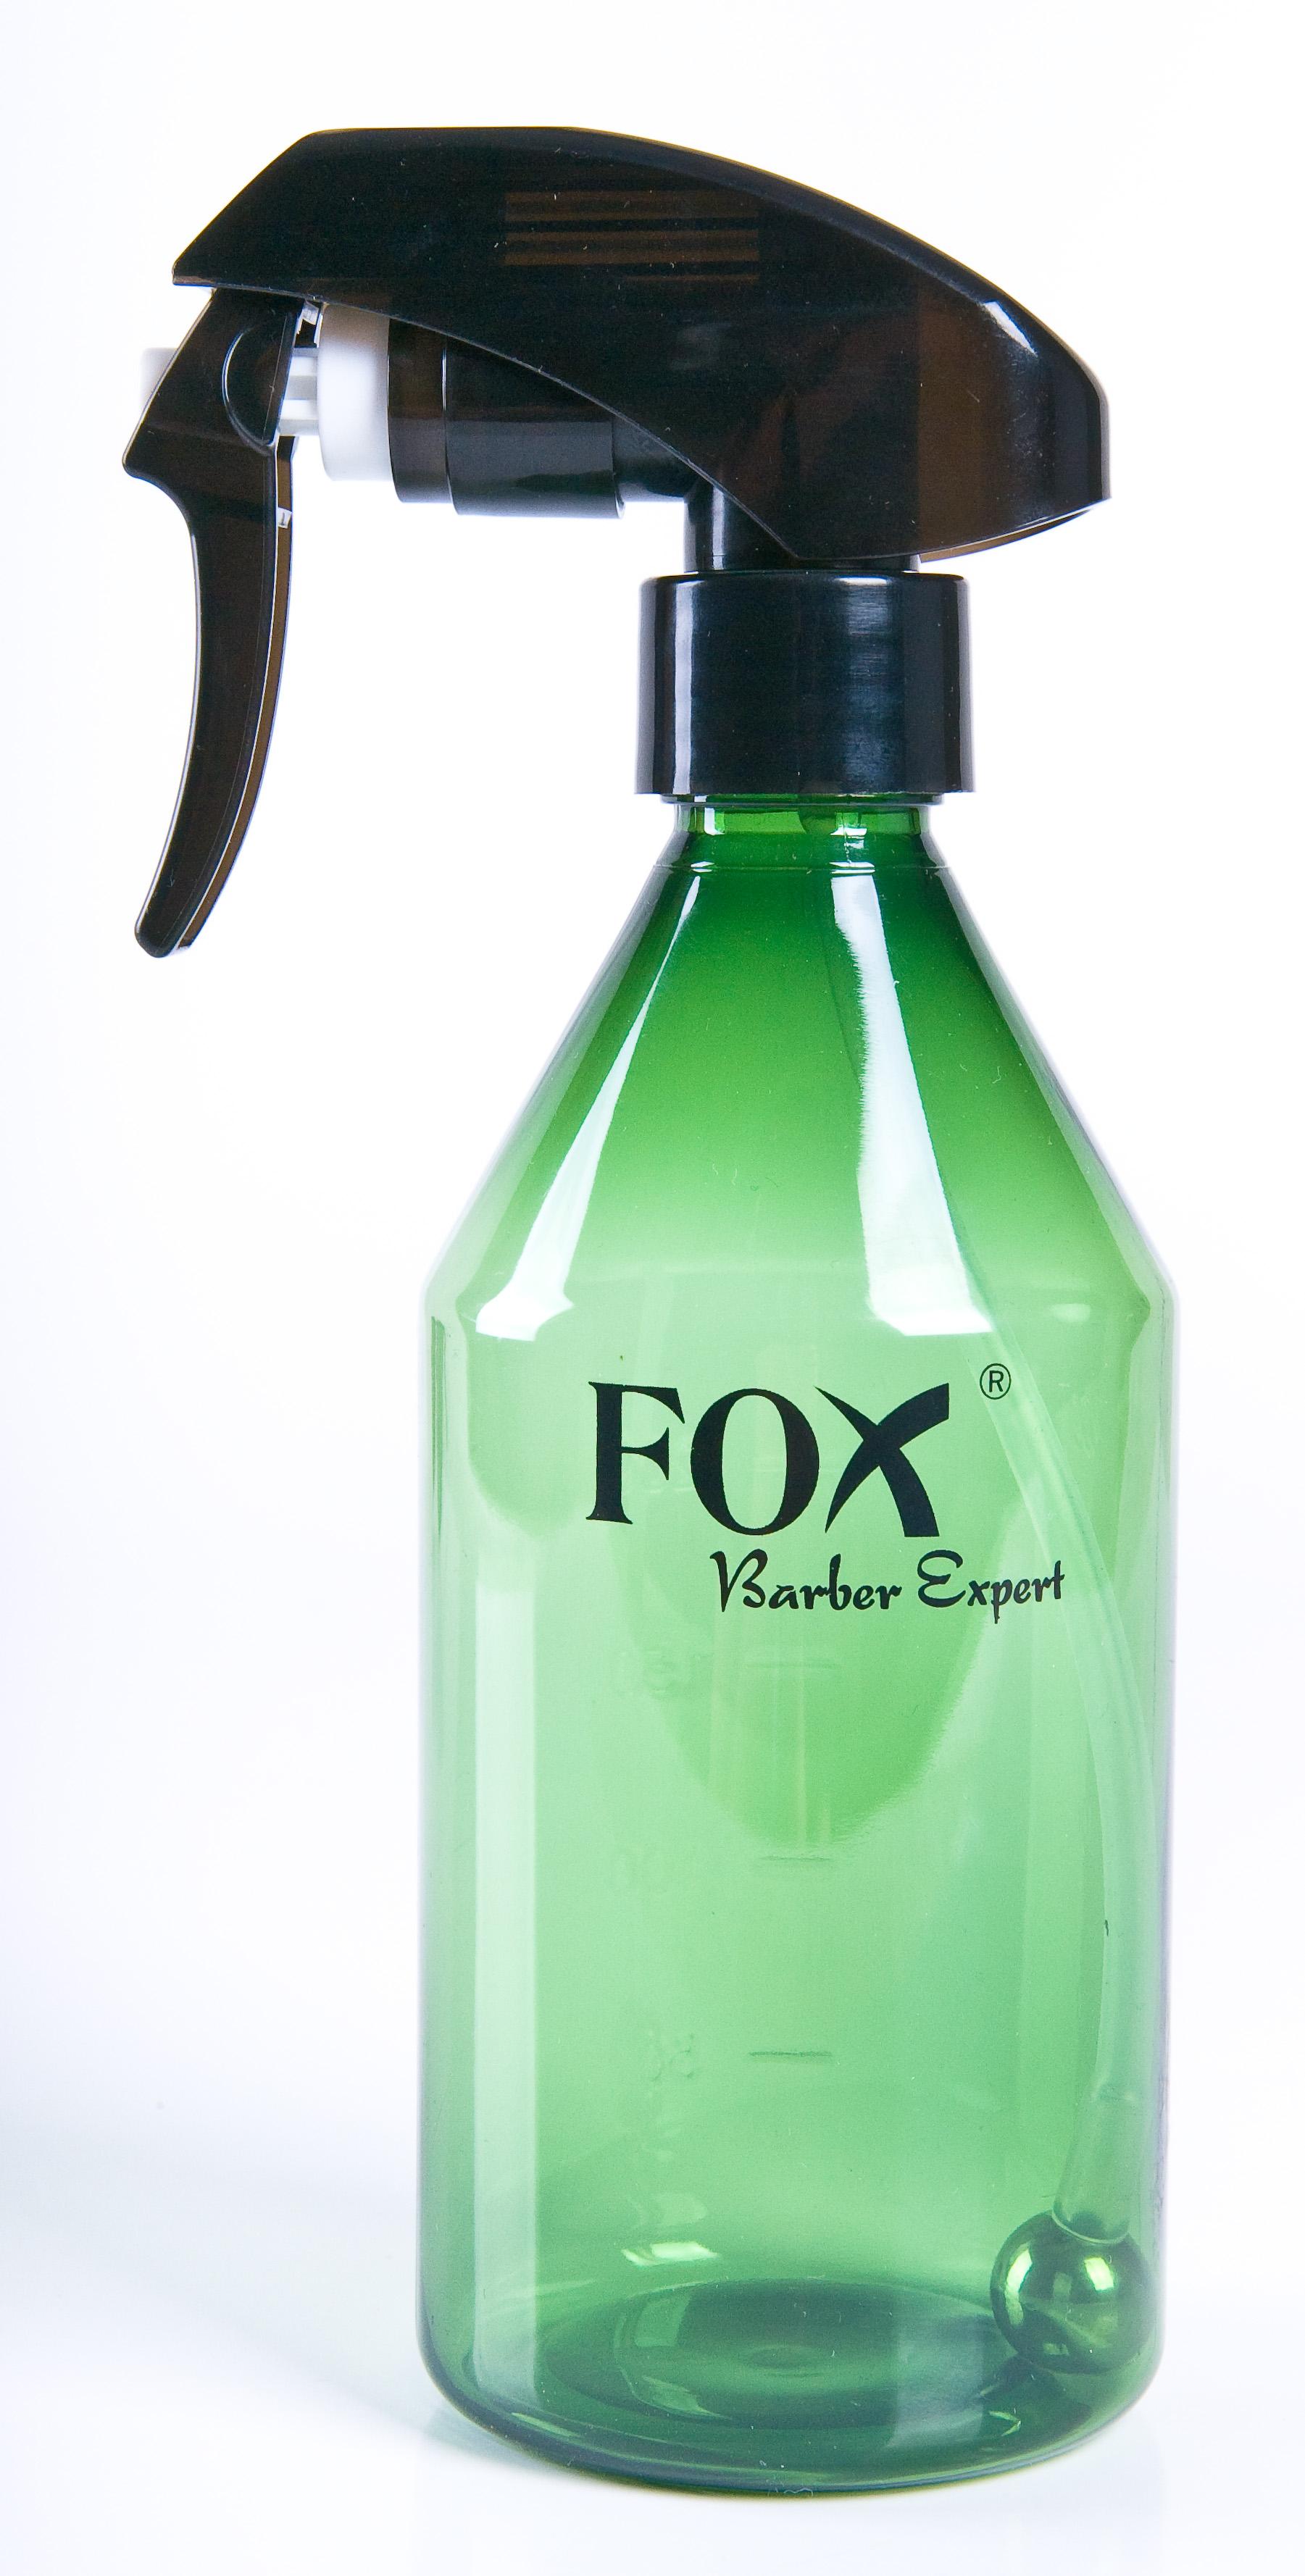 Rozprašovač FOX BARBER EXPERT zeleny- NOVINKA 300ml